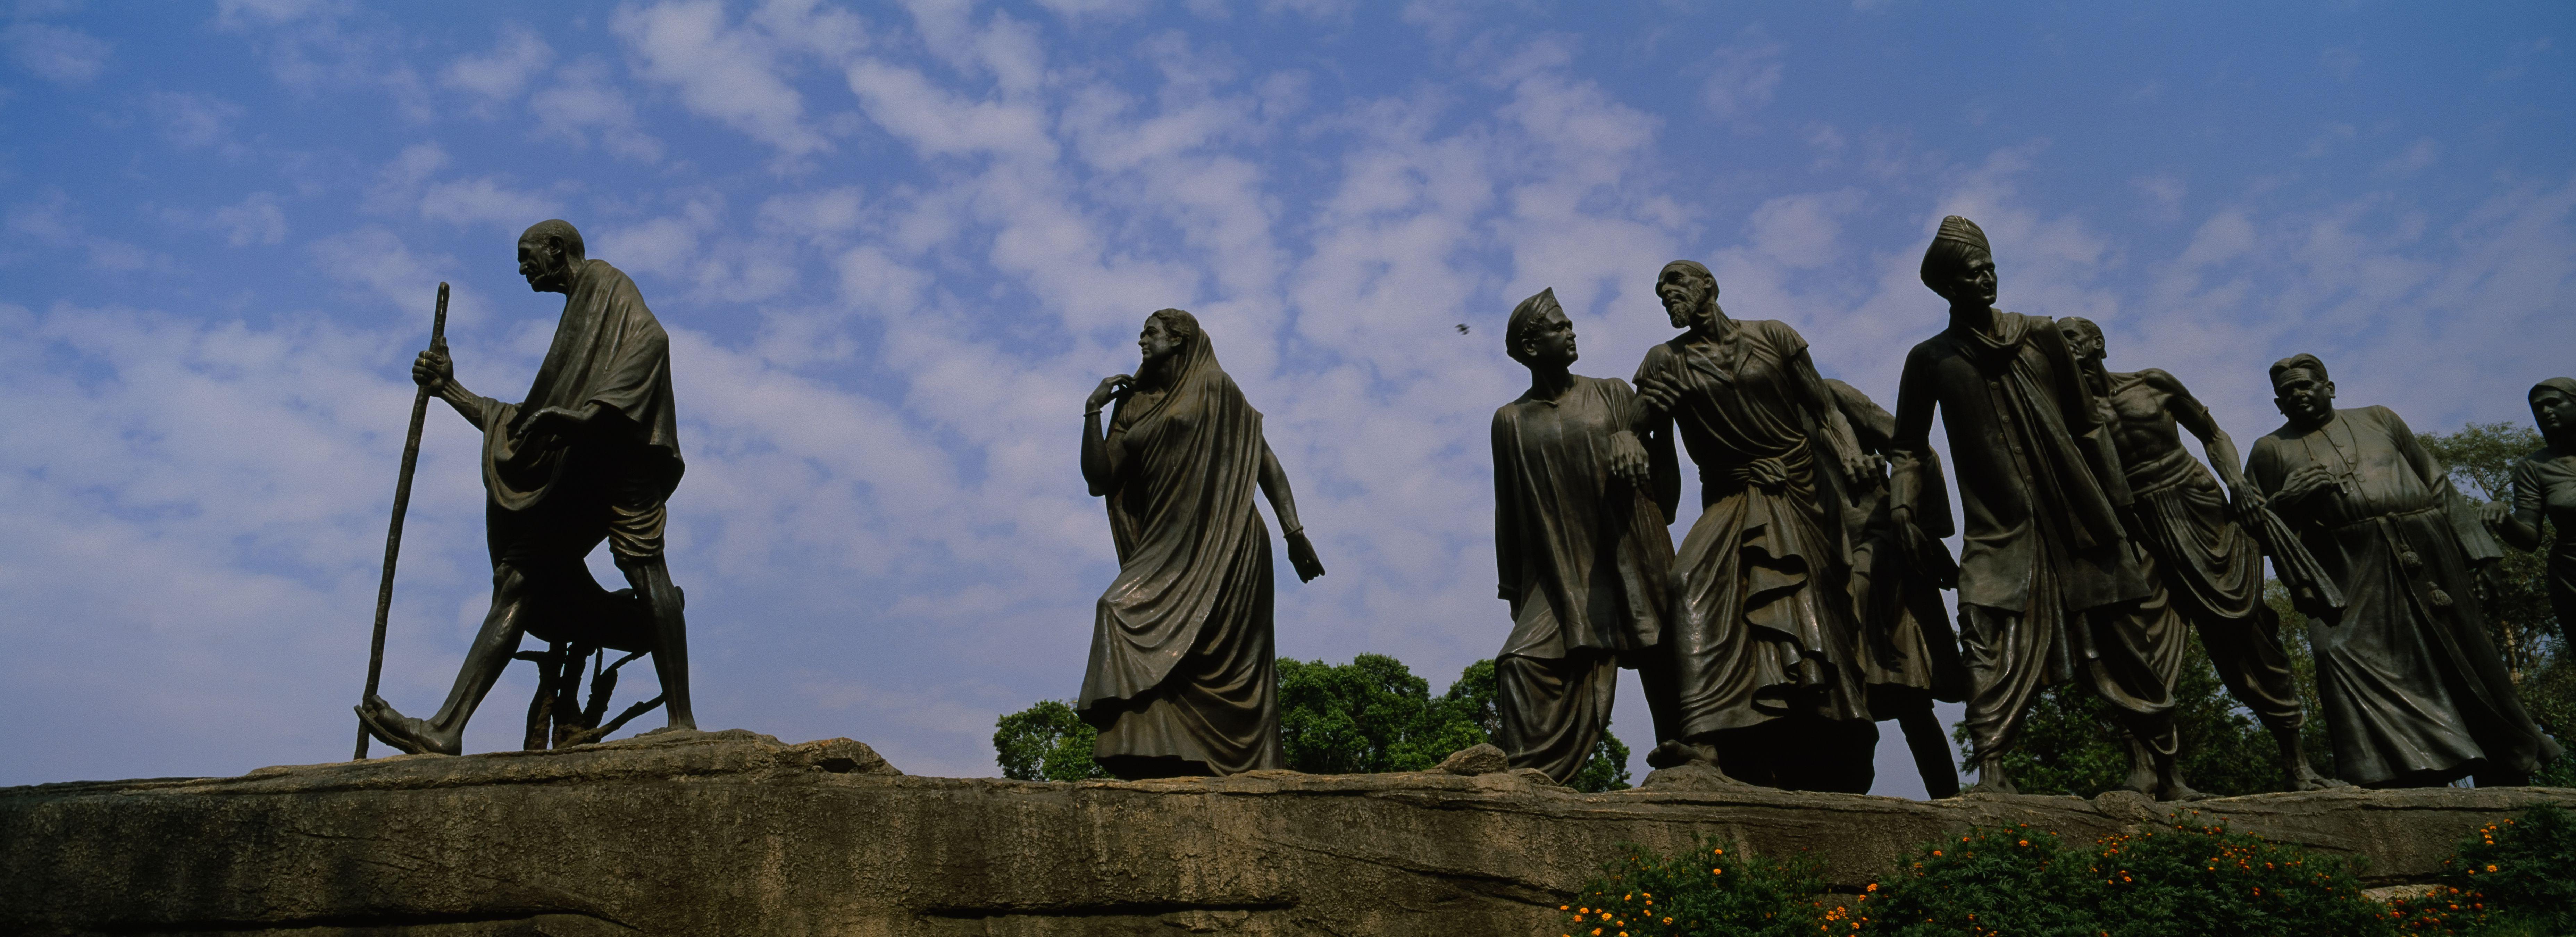 Remembering Gandhi's Salt March - HISTORY